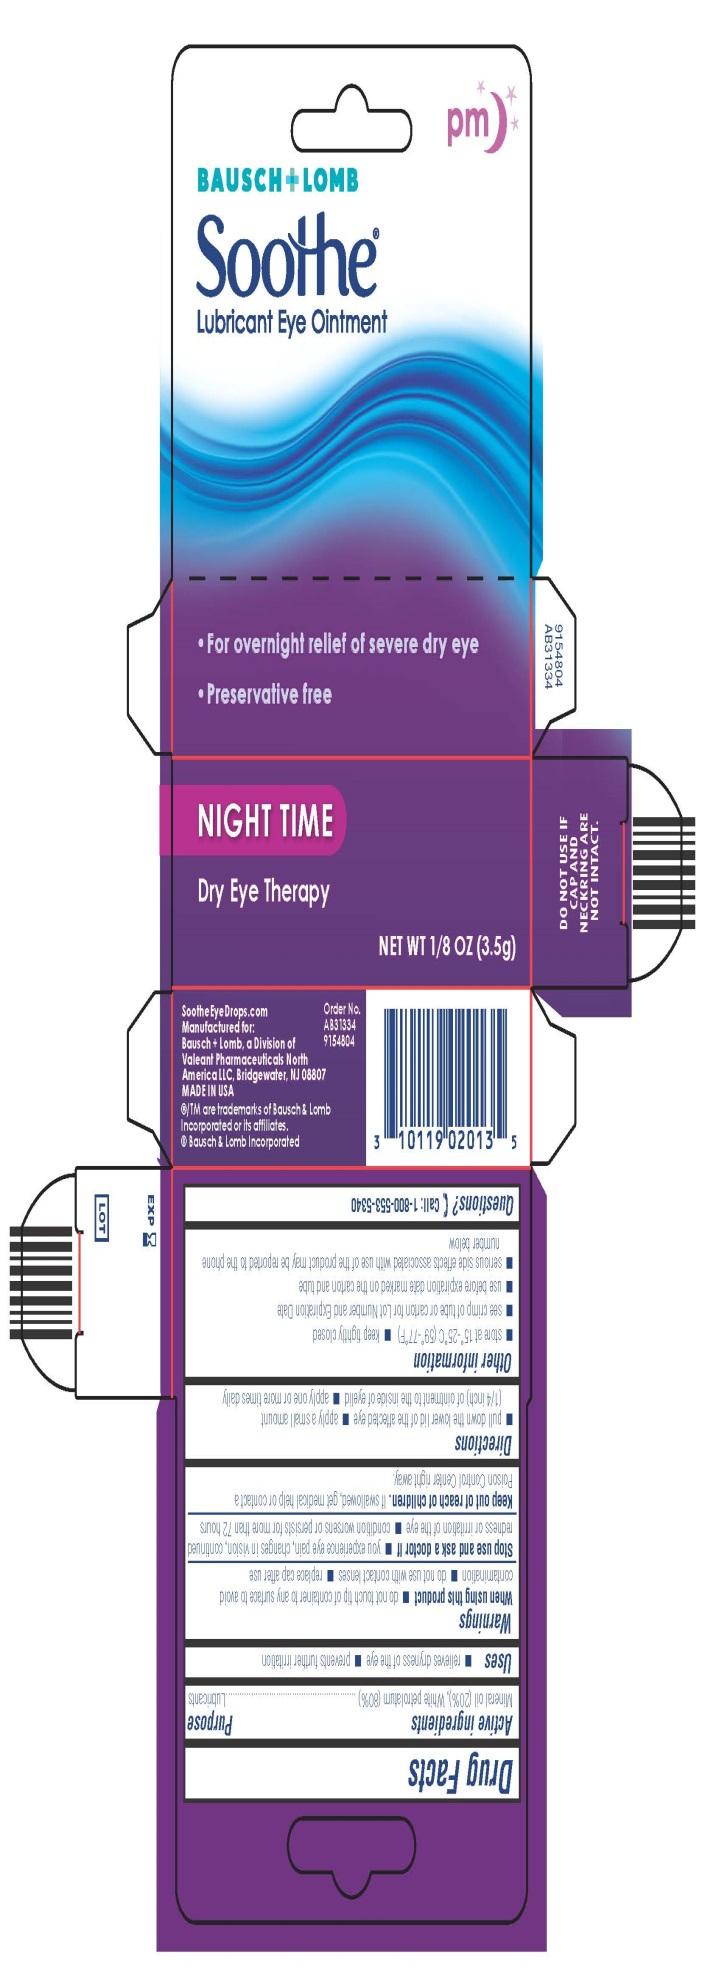 Soothe Night Time Carton